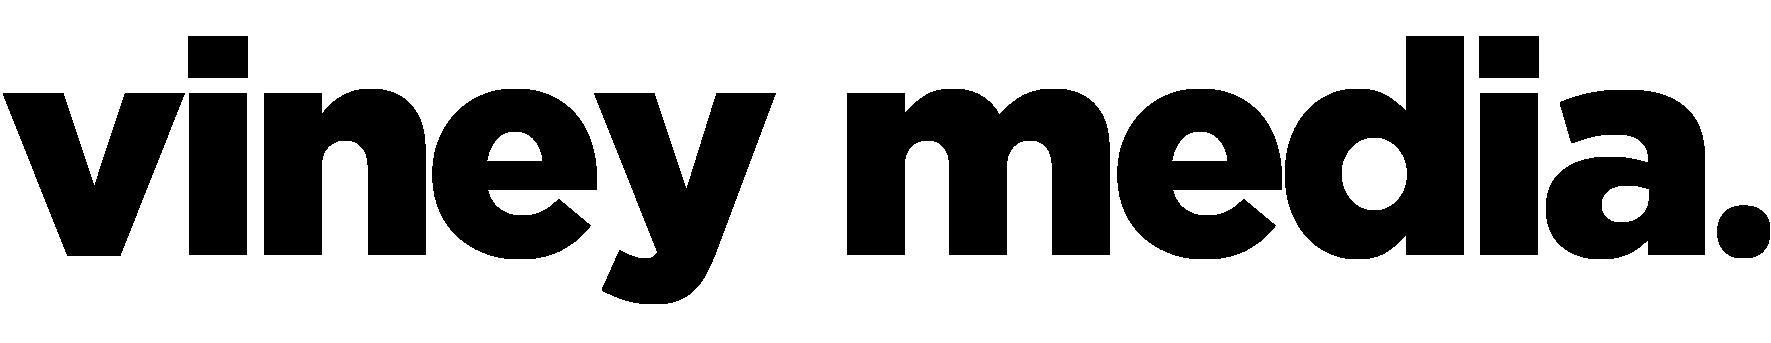 Viney Media | A New Breed Media Agency